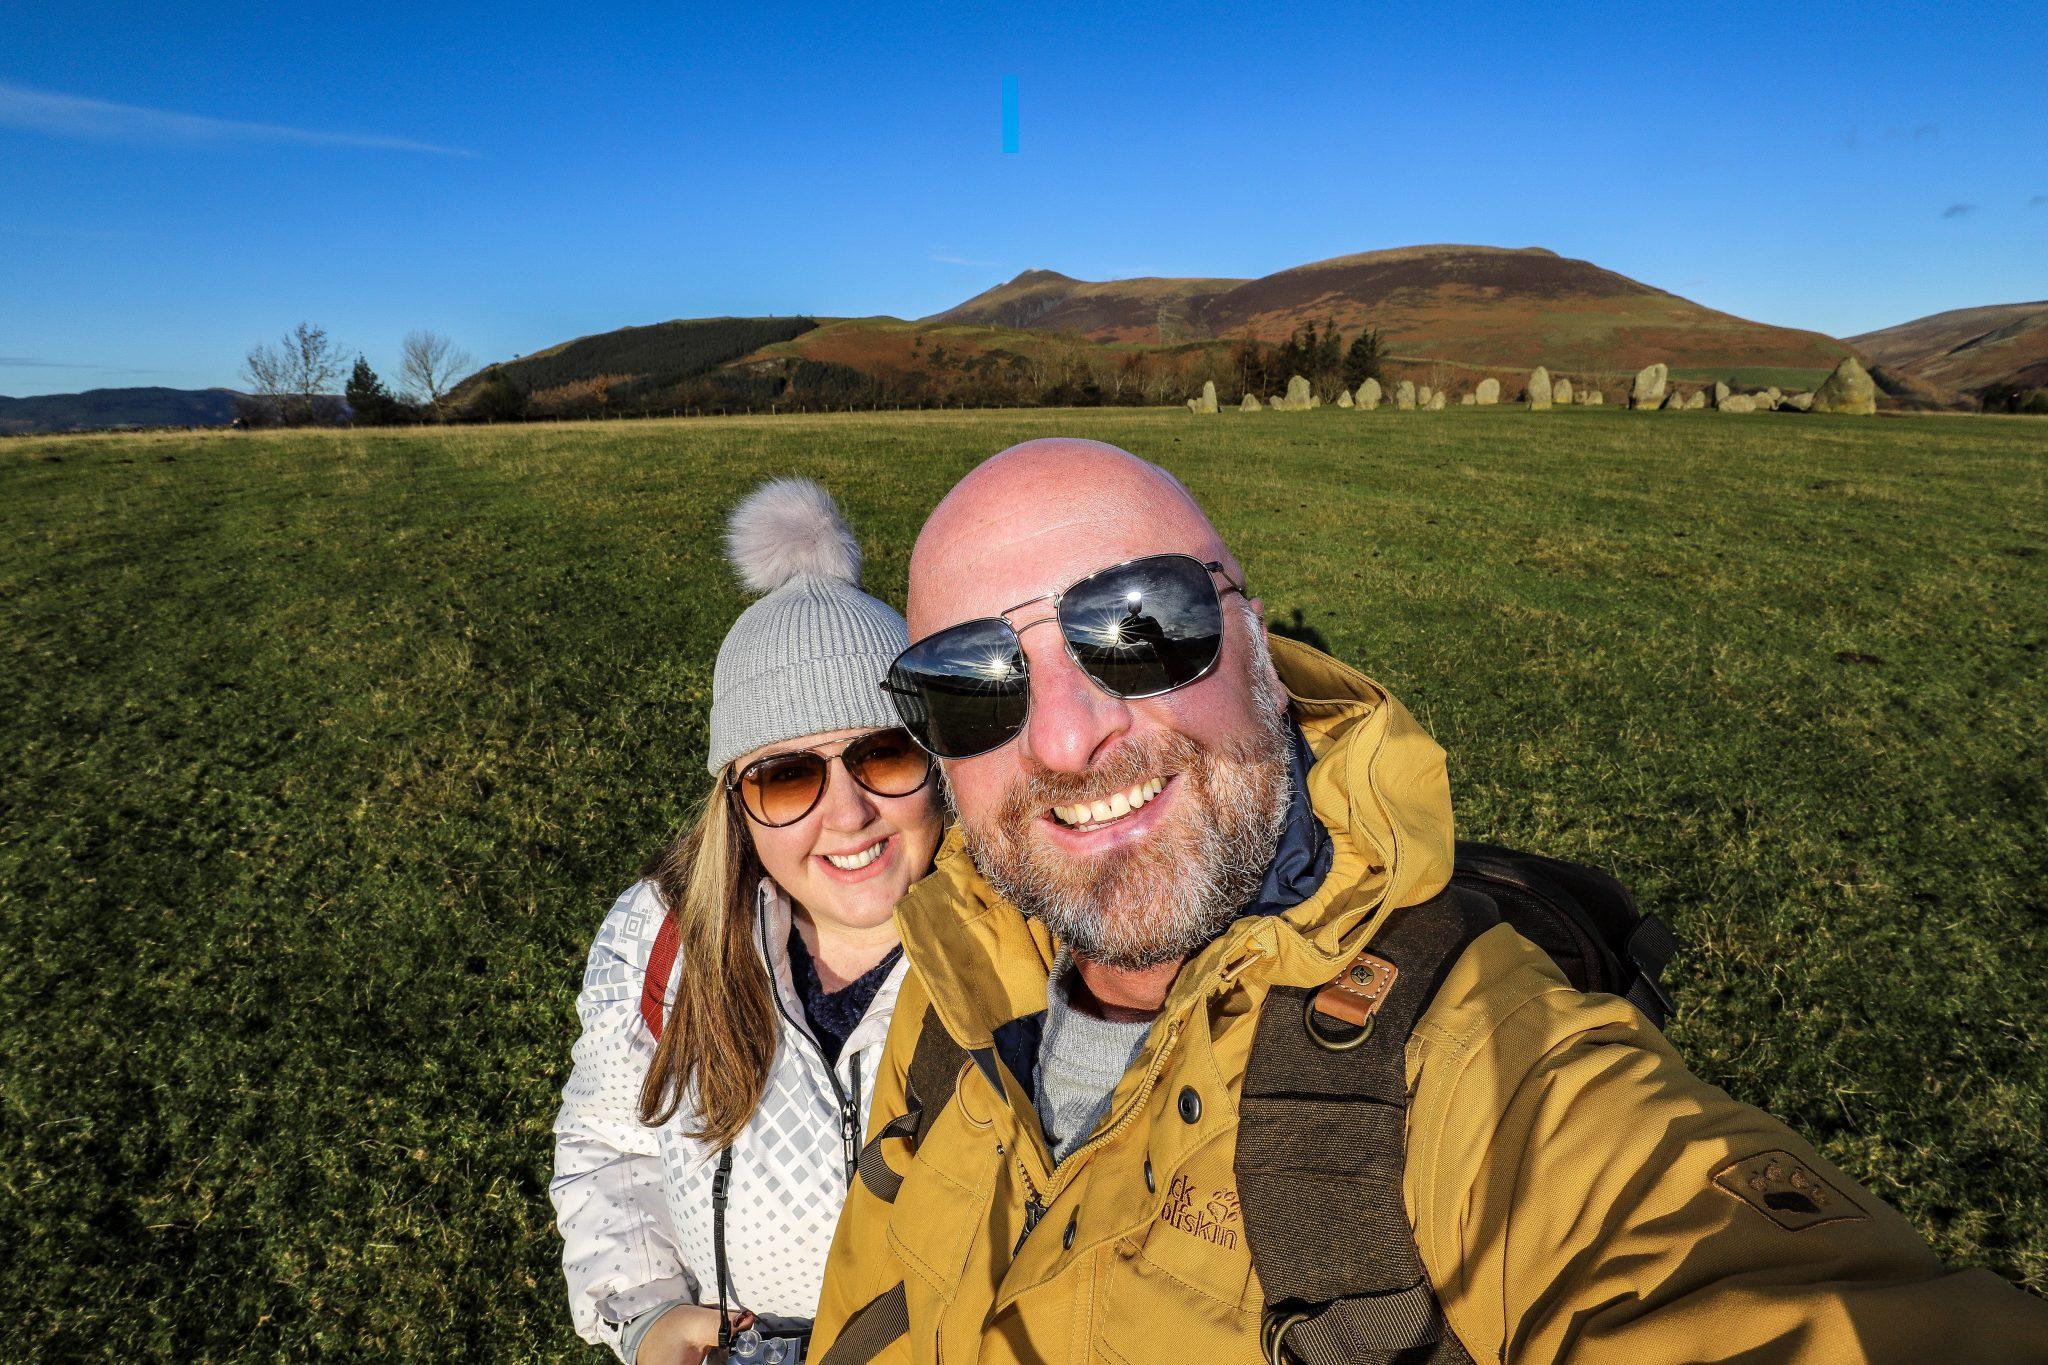 Castlerigg Stone Circle, The Lake District